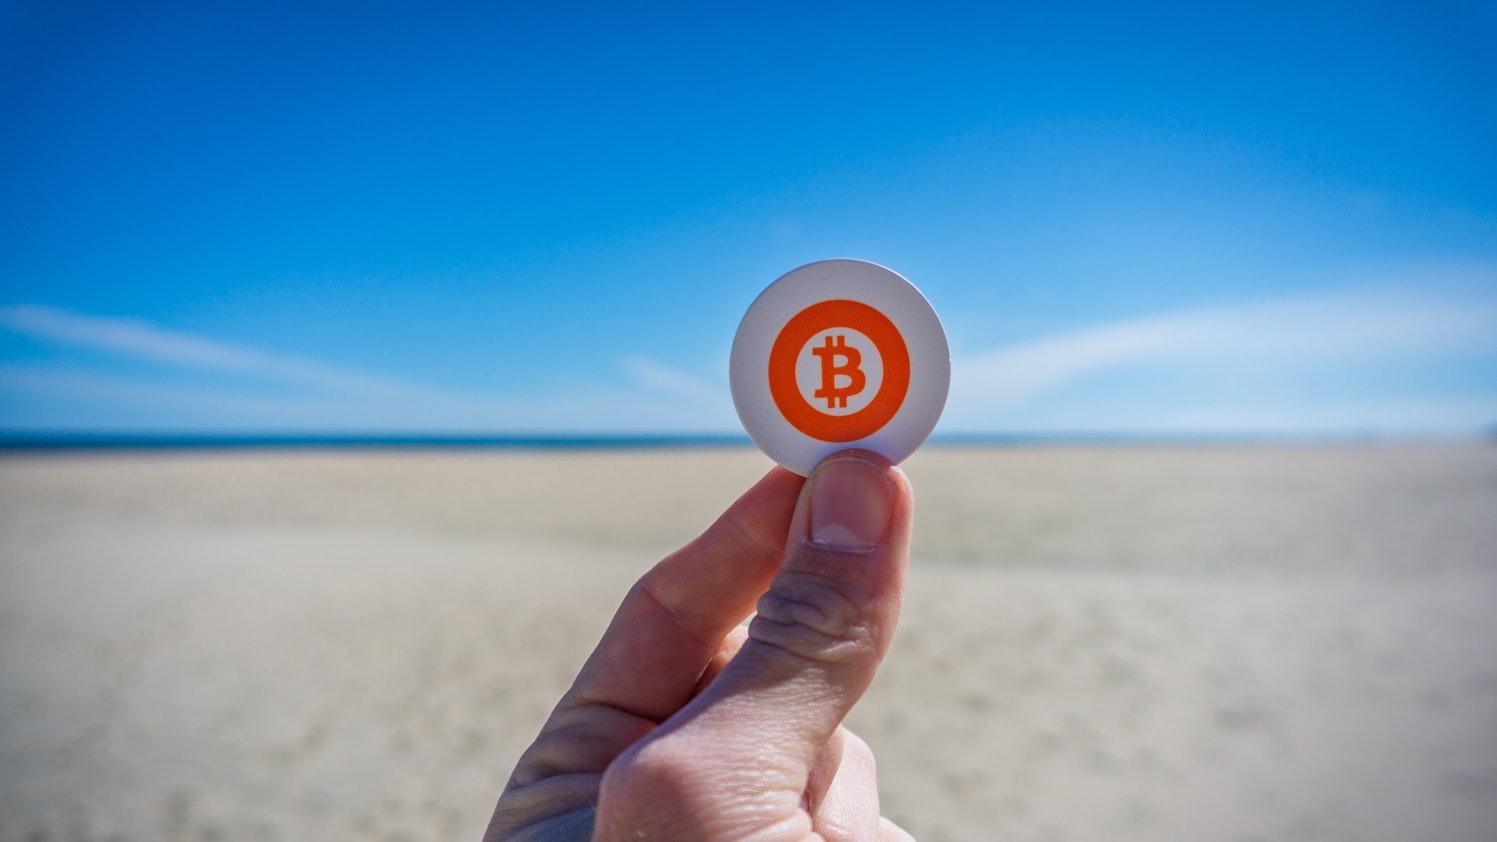 Blockchain and Non-fungible tokens